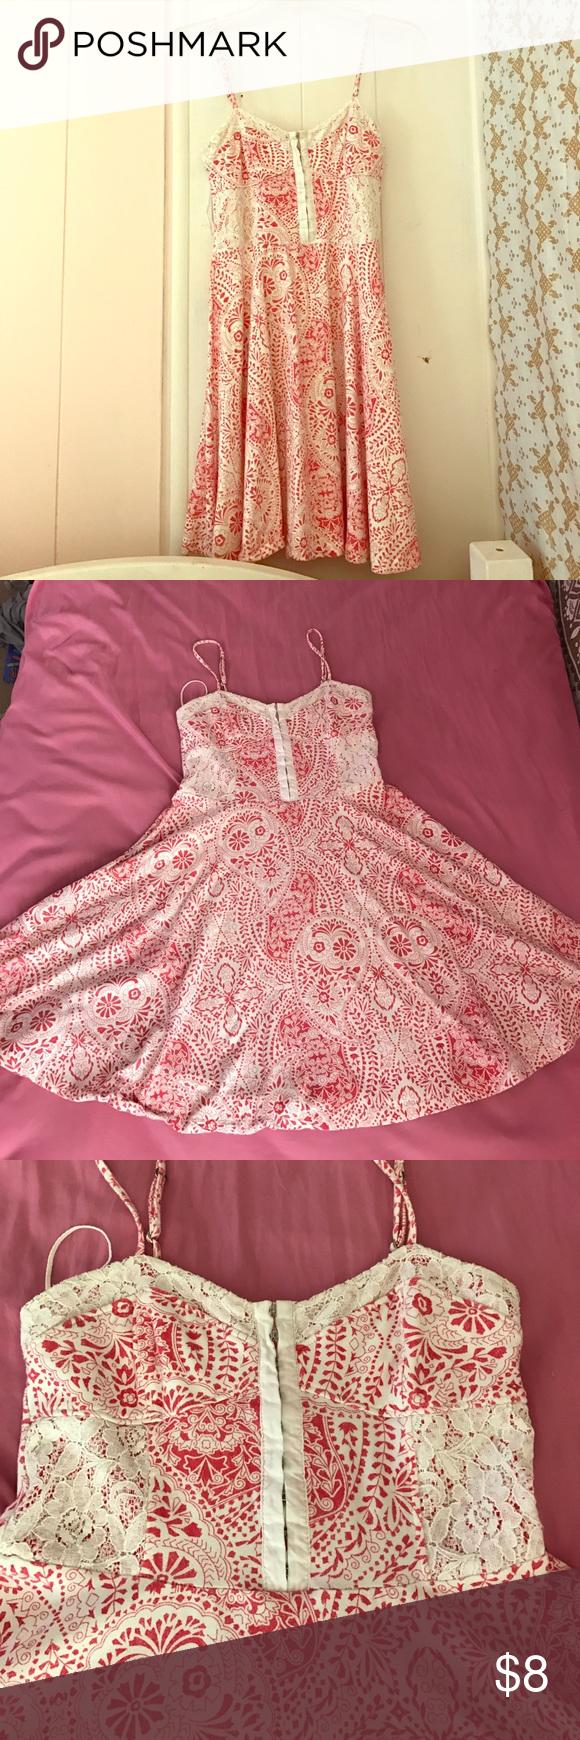 Aeropostale dress Soft Aeropostale dress. Super cute worn only once! Perfect for the summer! Aeropostale Dresses Mini